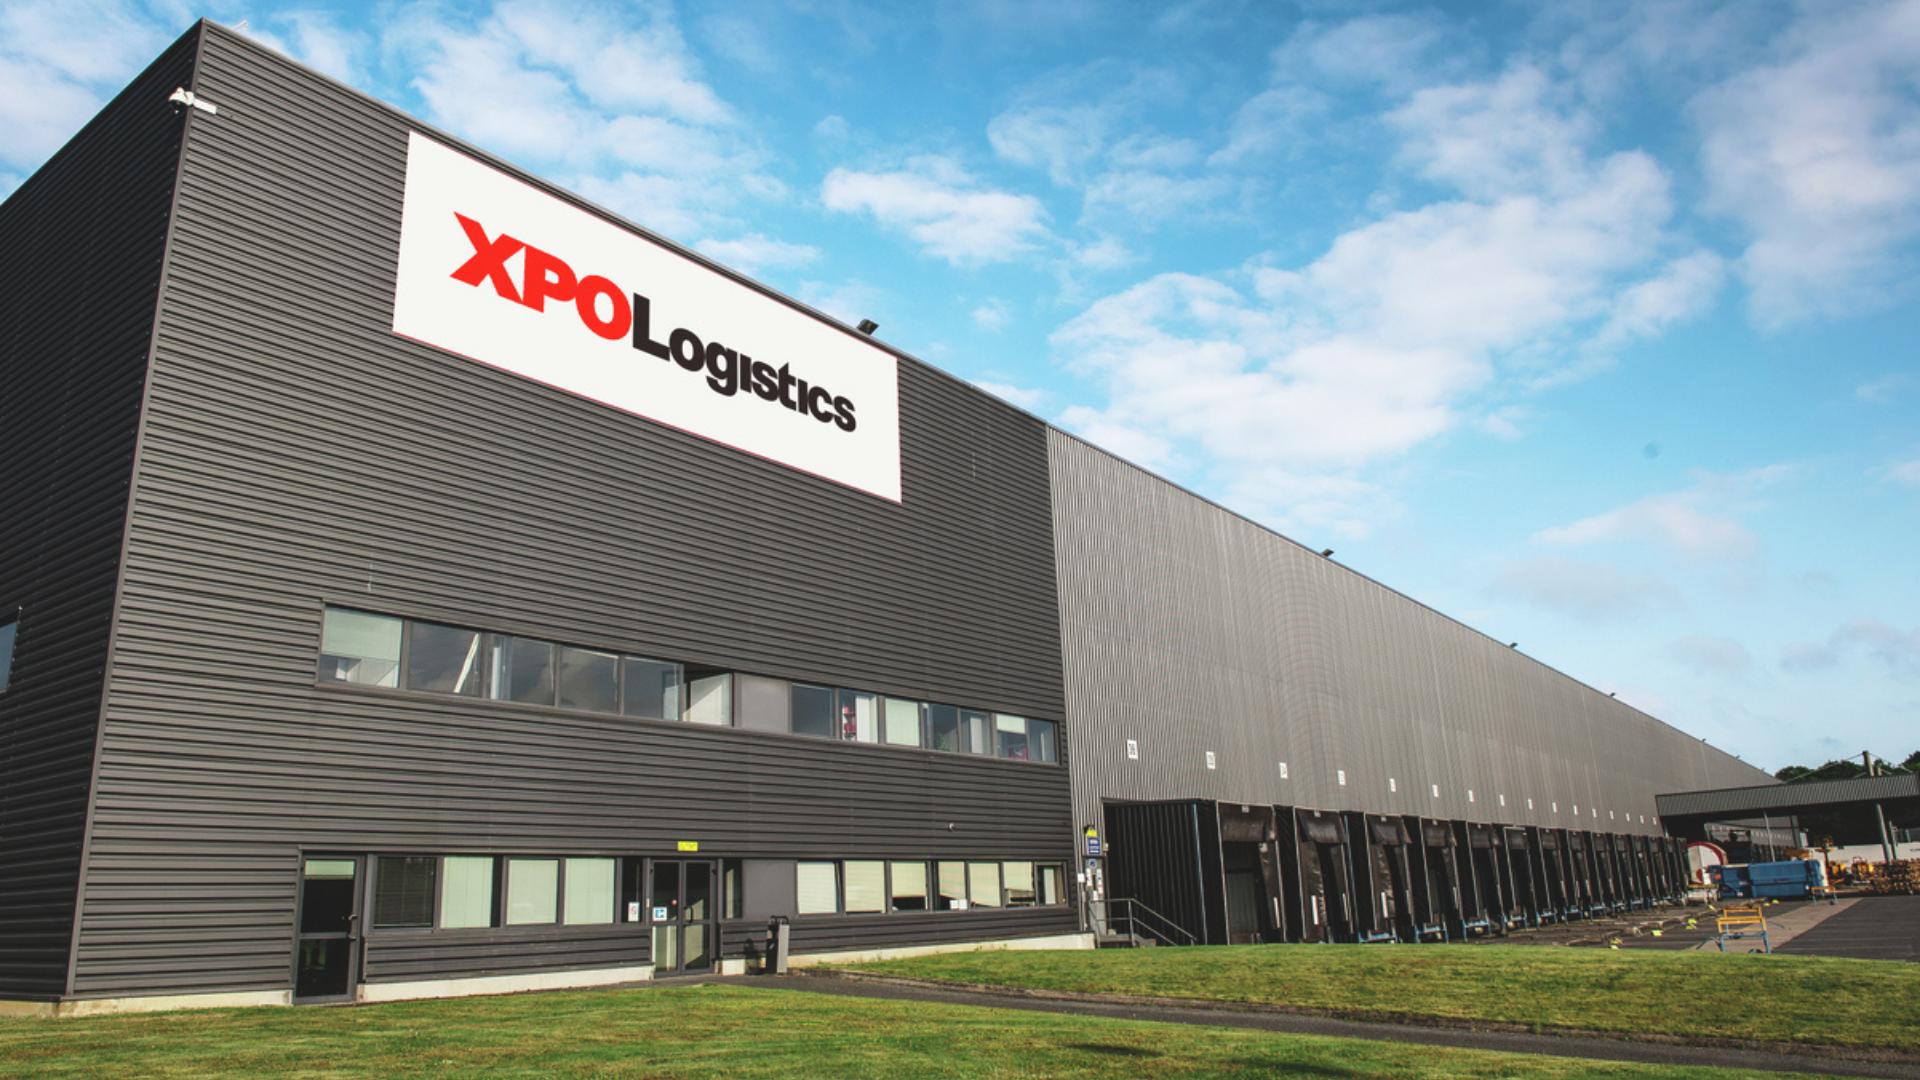 XPO warehouse